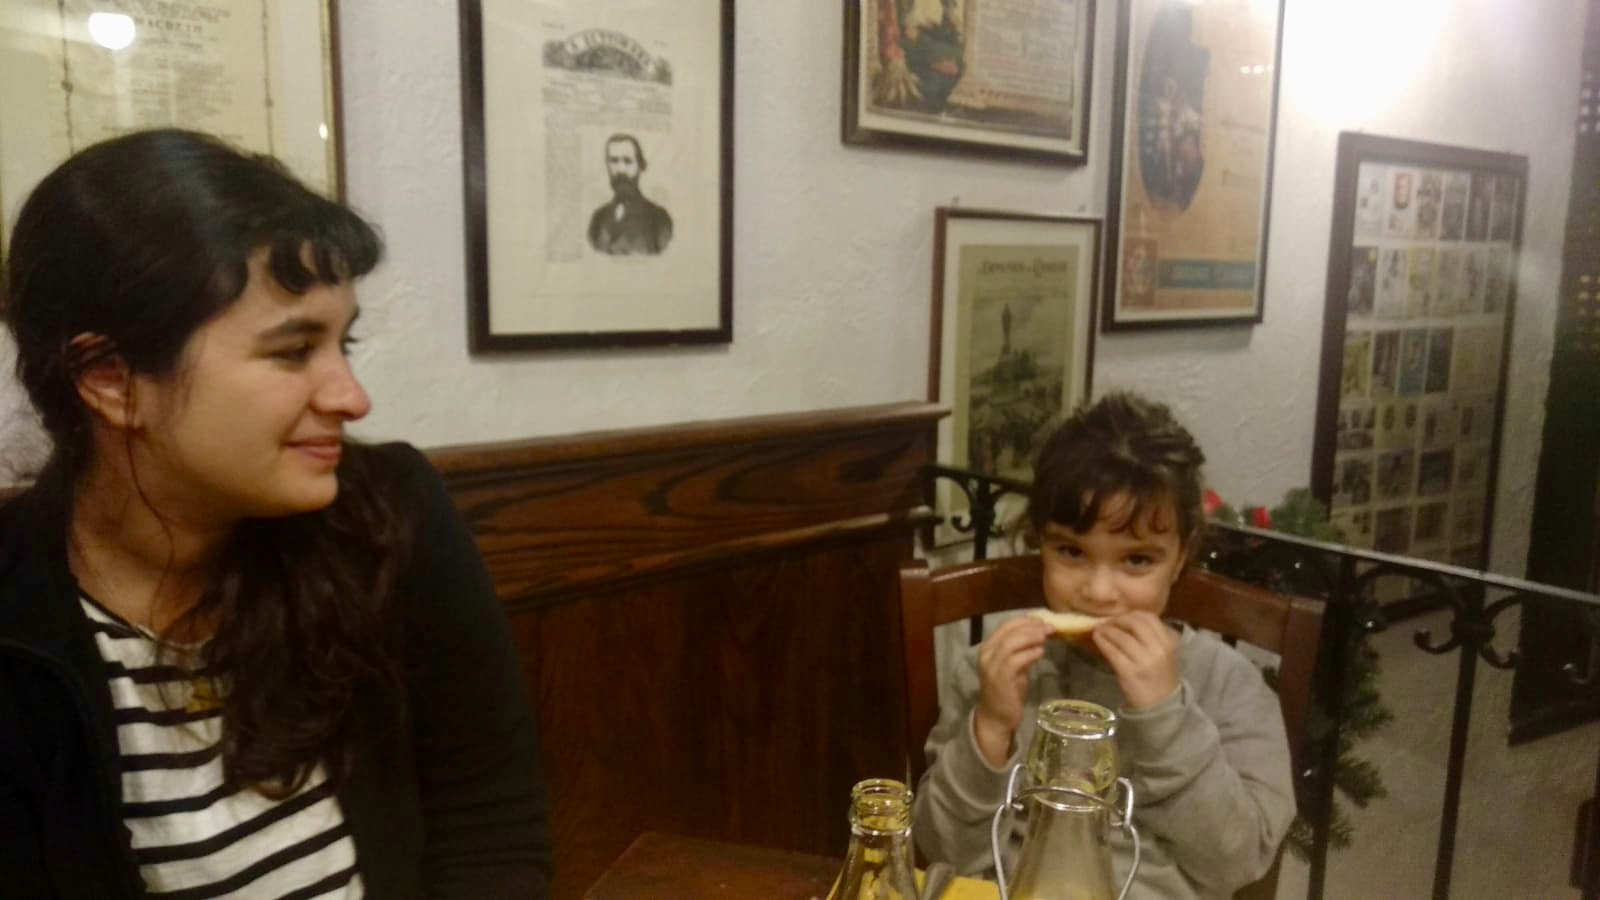 Salsamenteria di Parma-Via Ponte Vetero, 11 - Brera, Milan